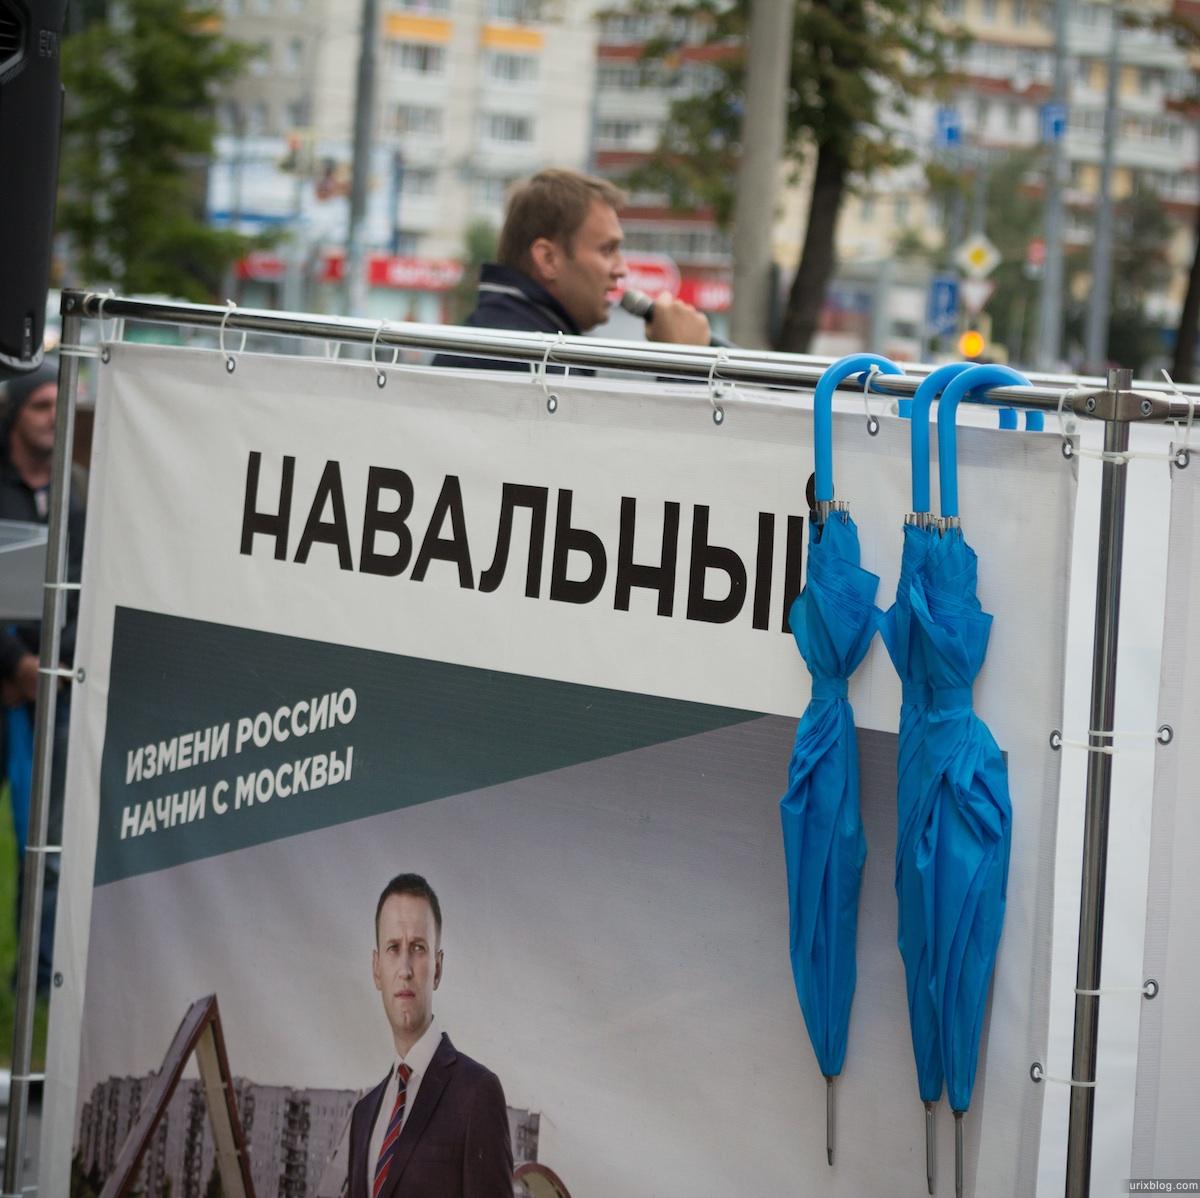 2013, Moscow, Russia, Preobrazhenskaja square, Aleksei Navalny, meeting